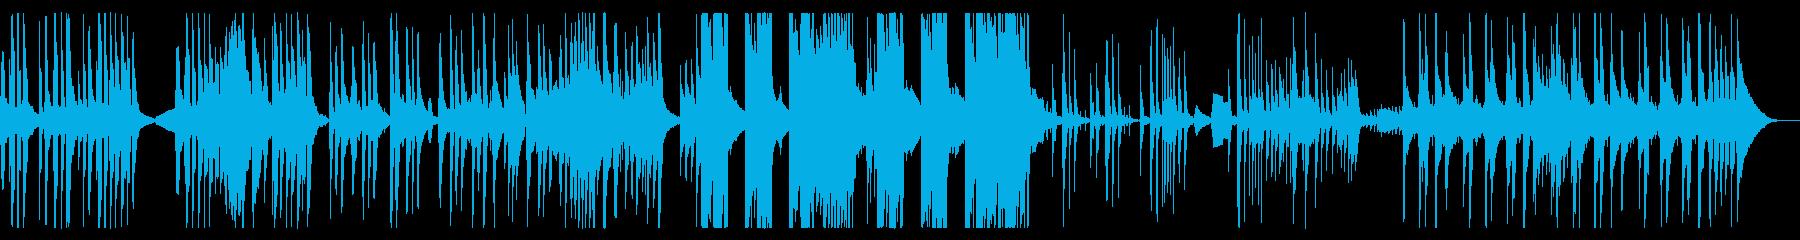 Bone Ukuleleの再生済みの波形